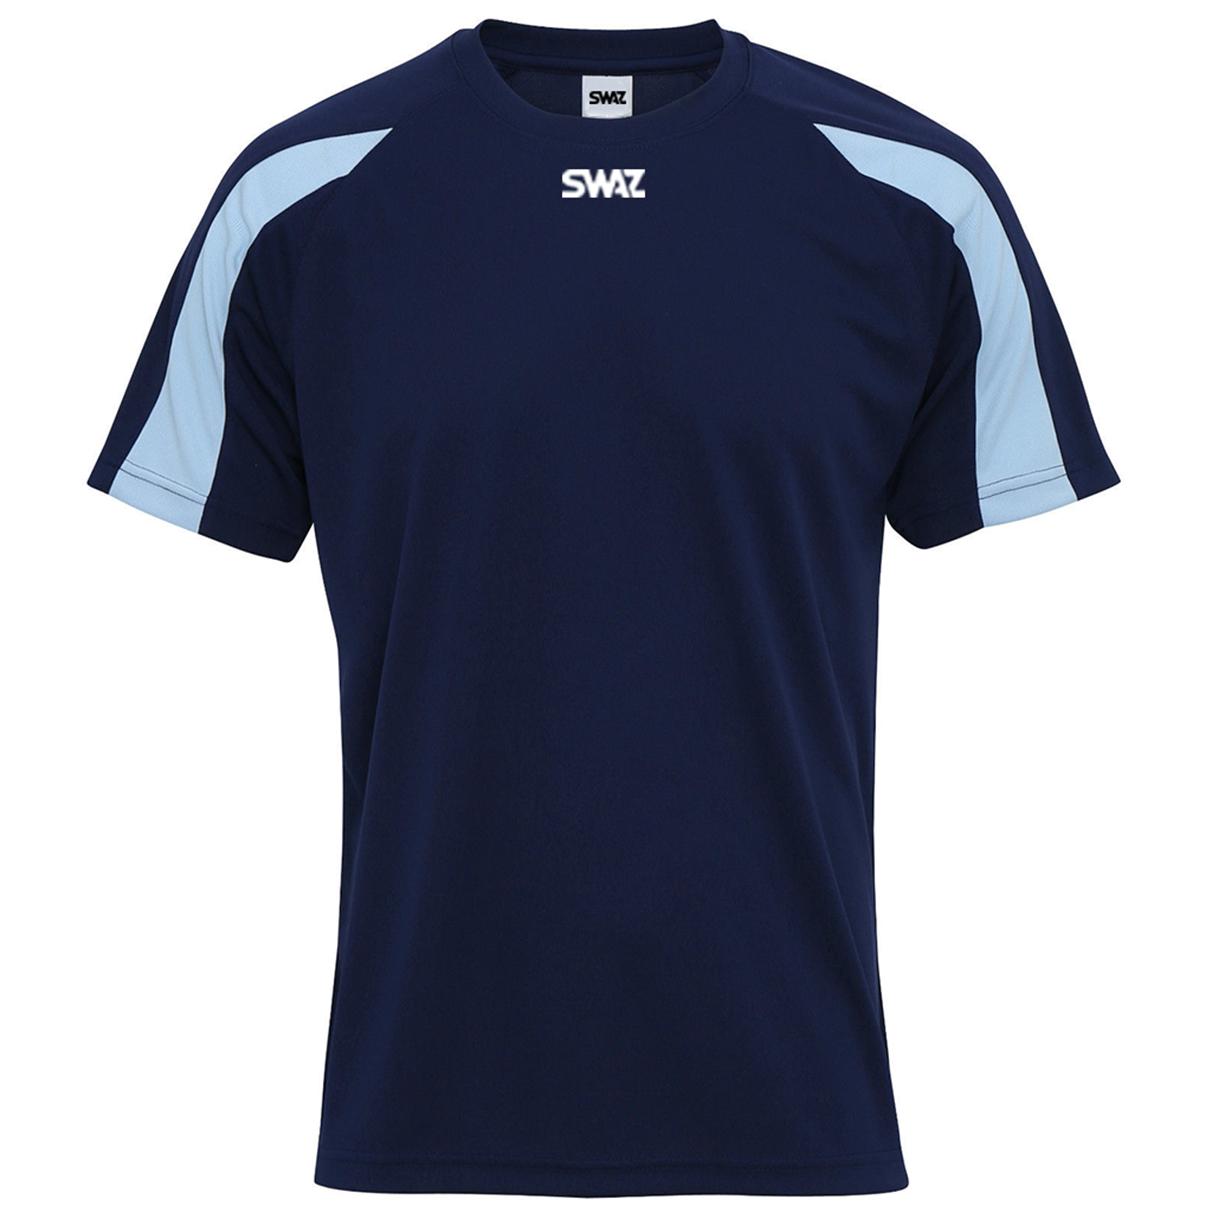 SWAZ Premier Training T-Shirt – Navy/Sky